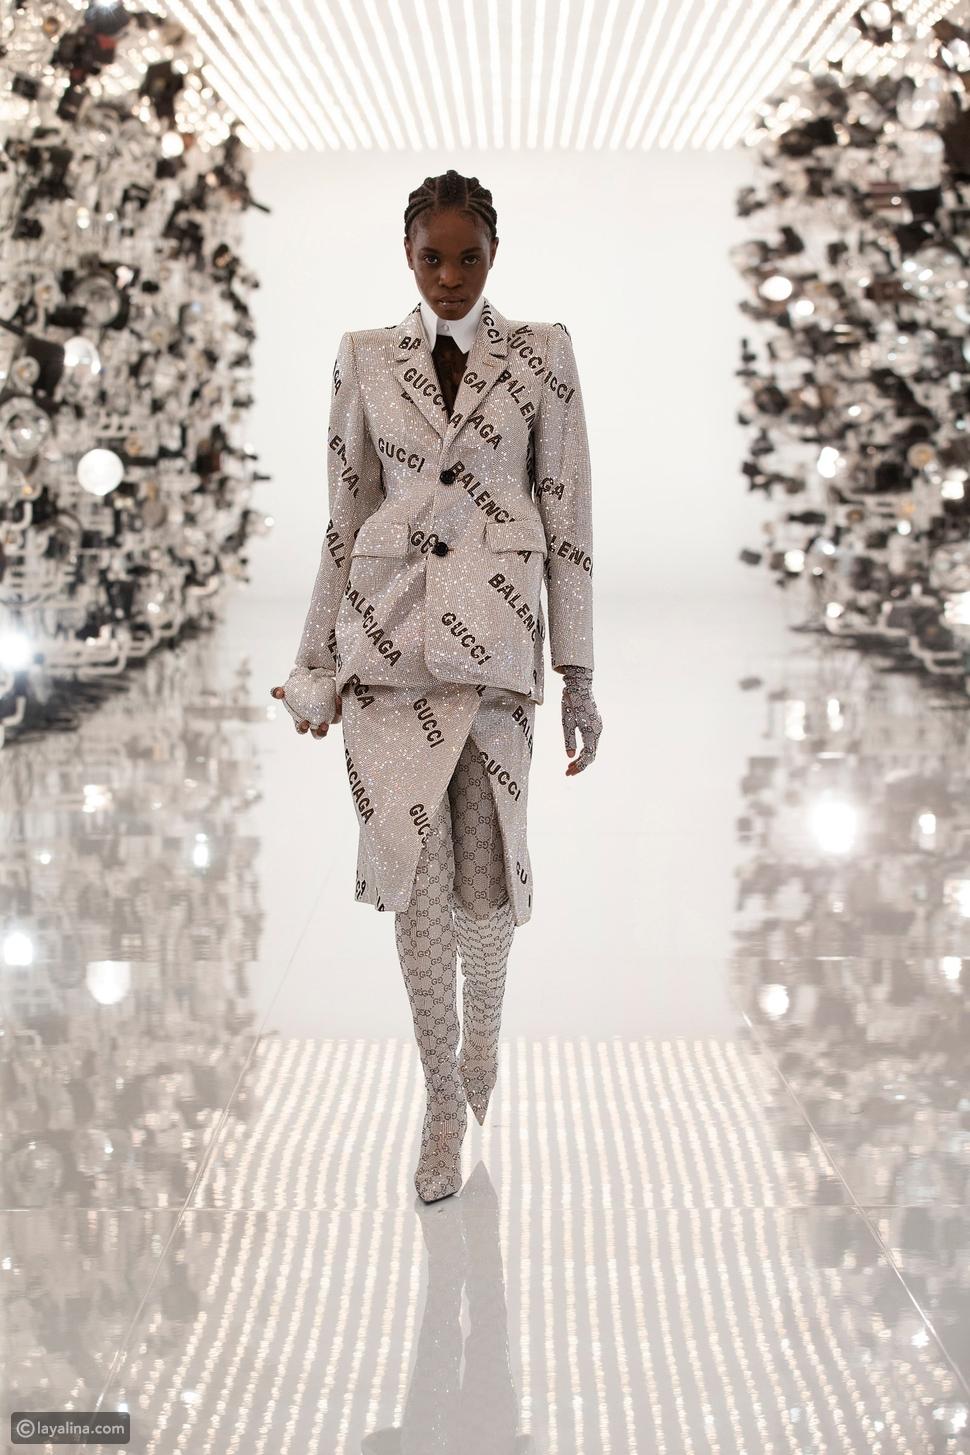 Gucci تقدم مجموعتها الجديدة في لوس أنجلوس: احتفالاً بعامها المئوي